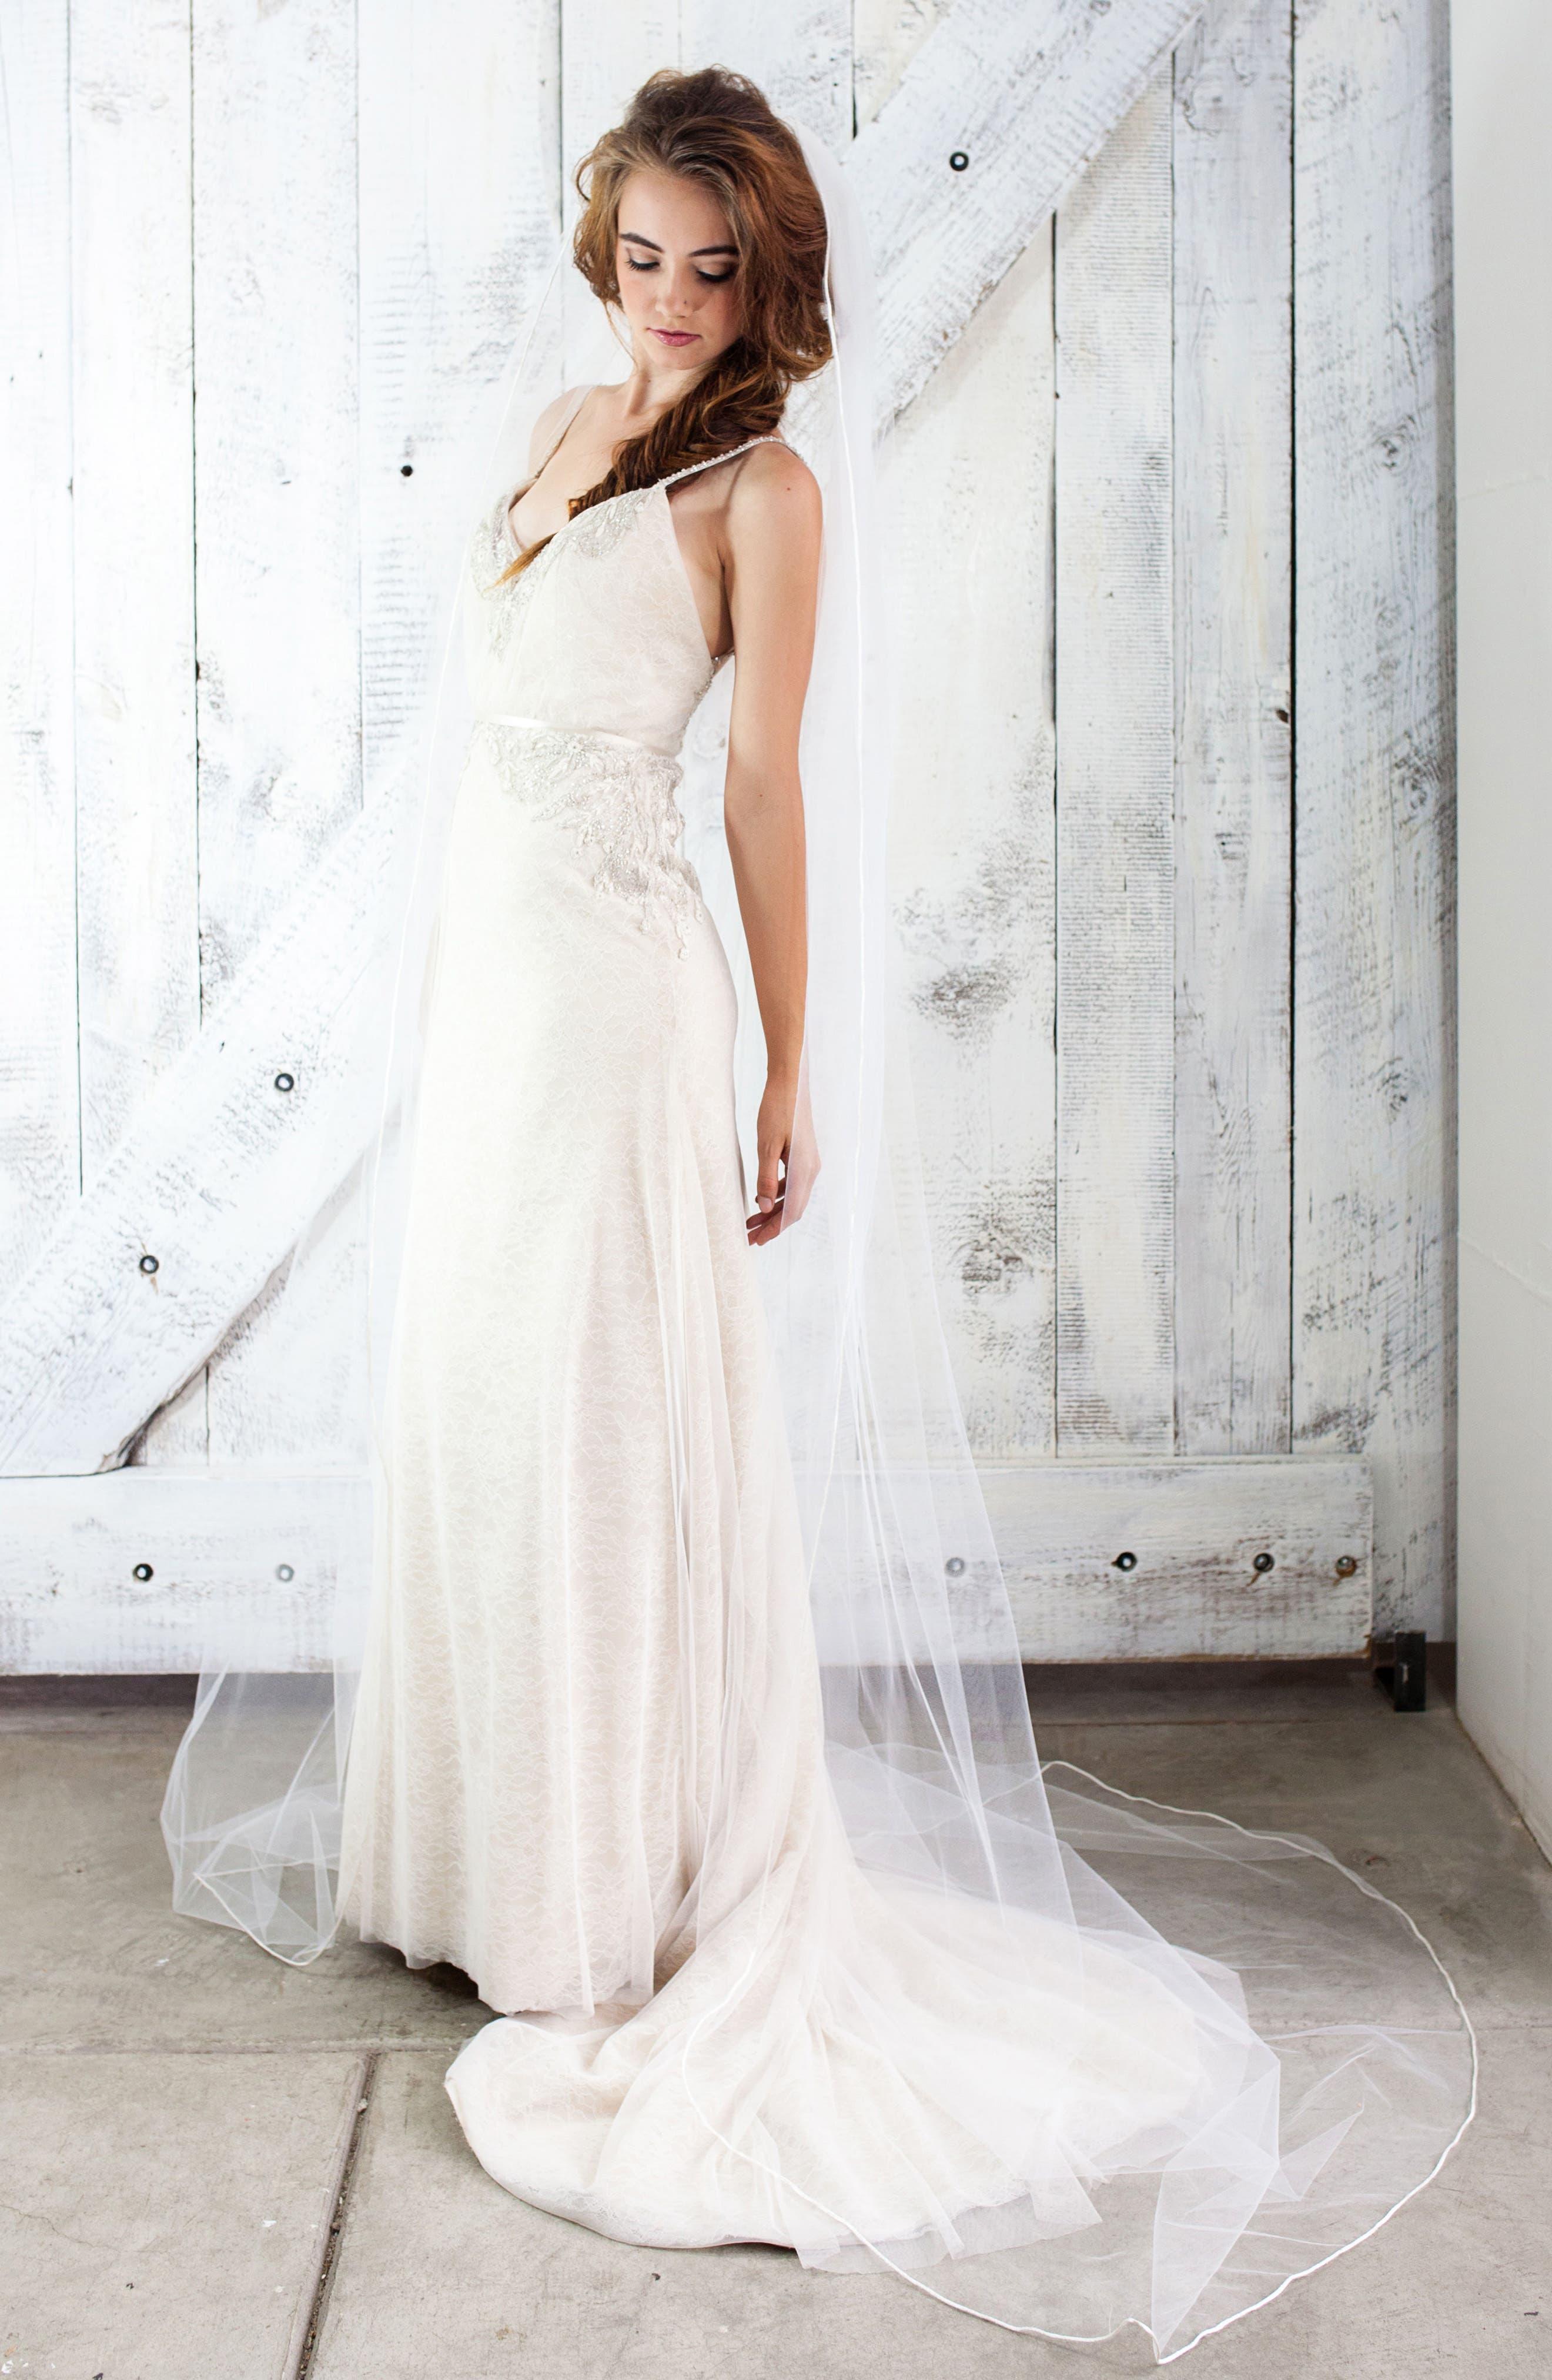 Alternate Image 1 Selected - Veil Trends Kauai Mesh Bridal Veil